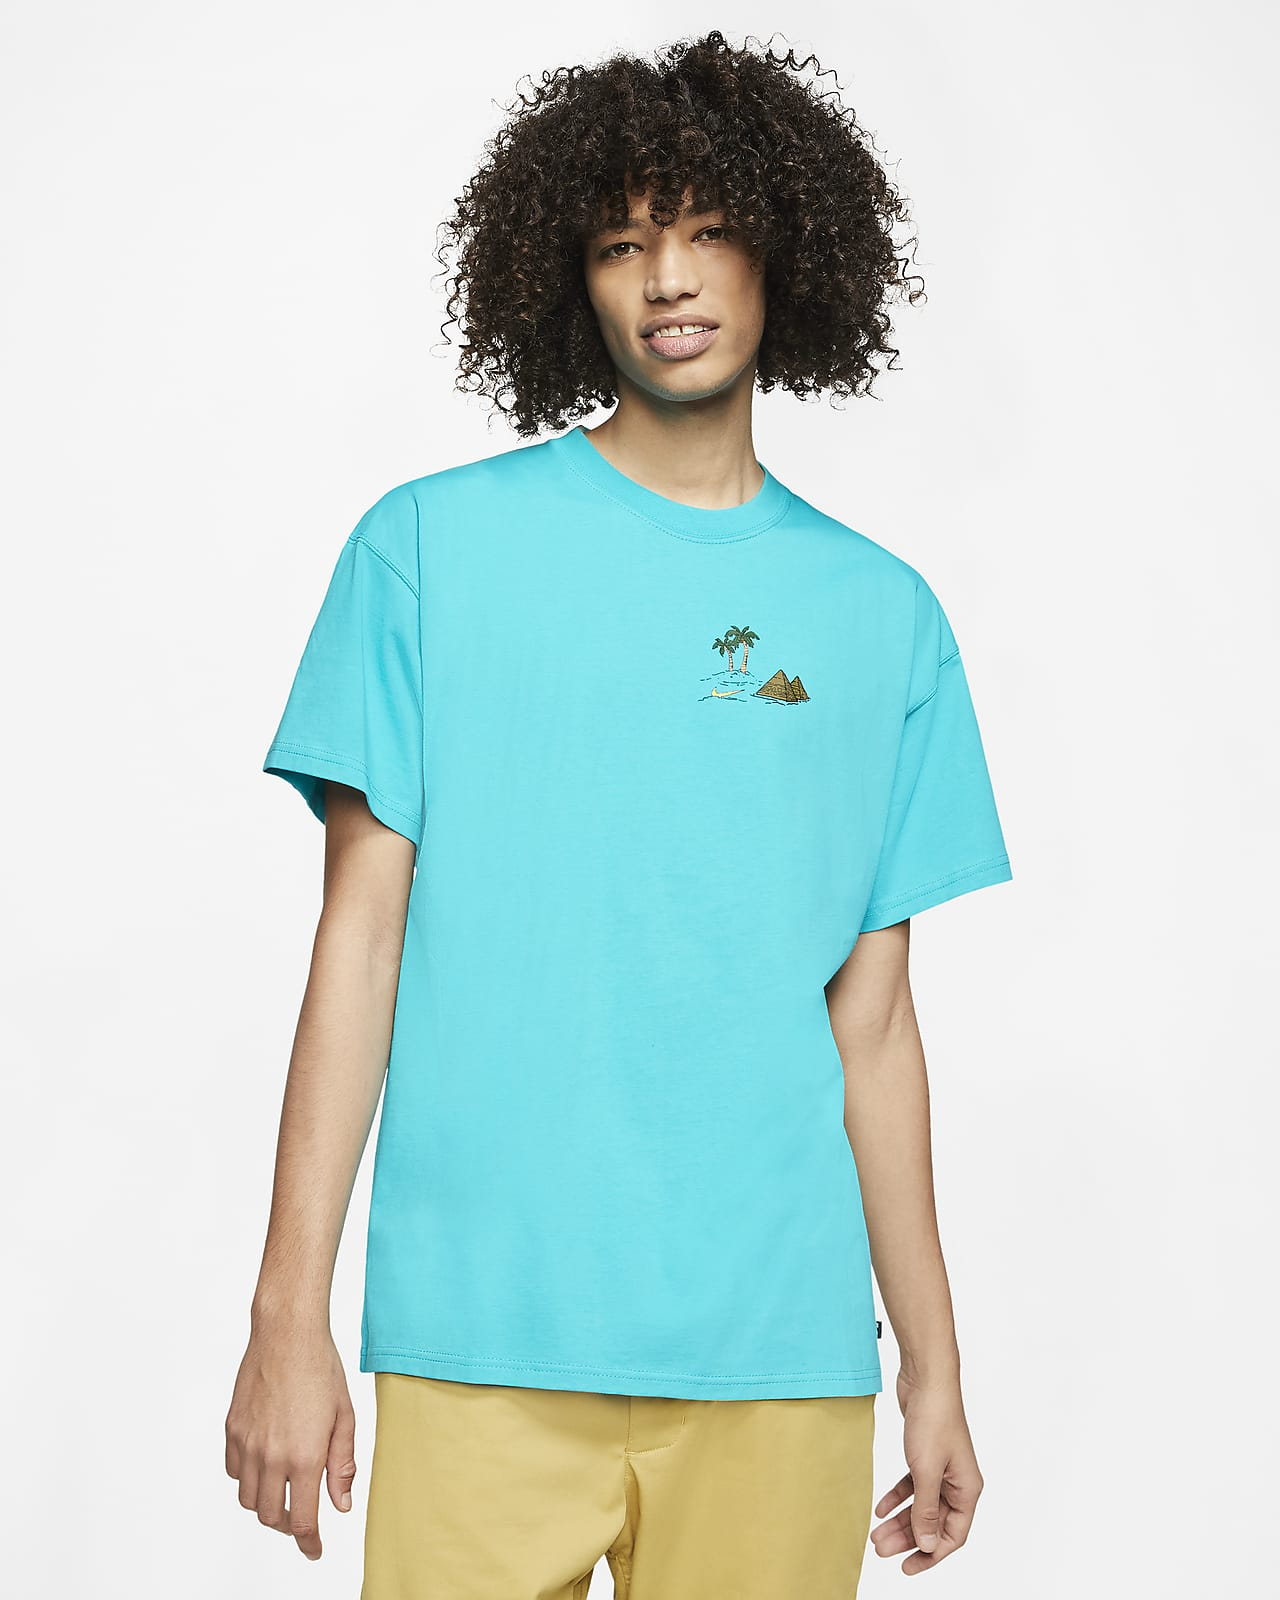 Tee shirt de skateboard Nike SB pour Homme